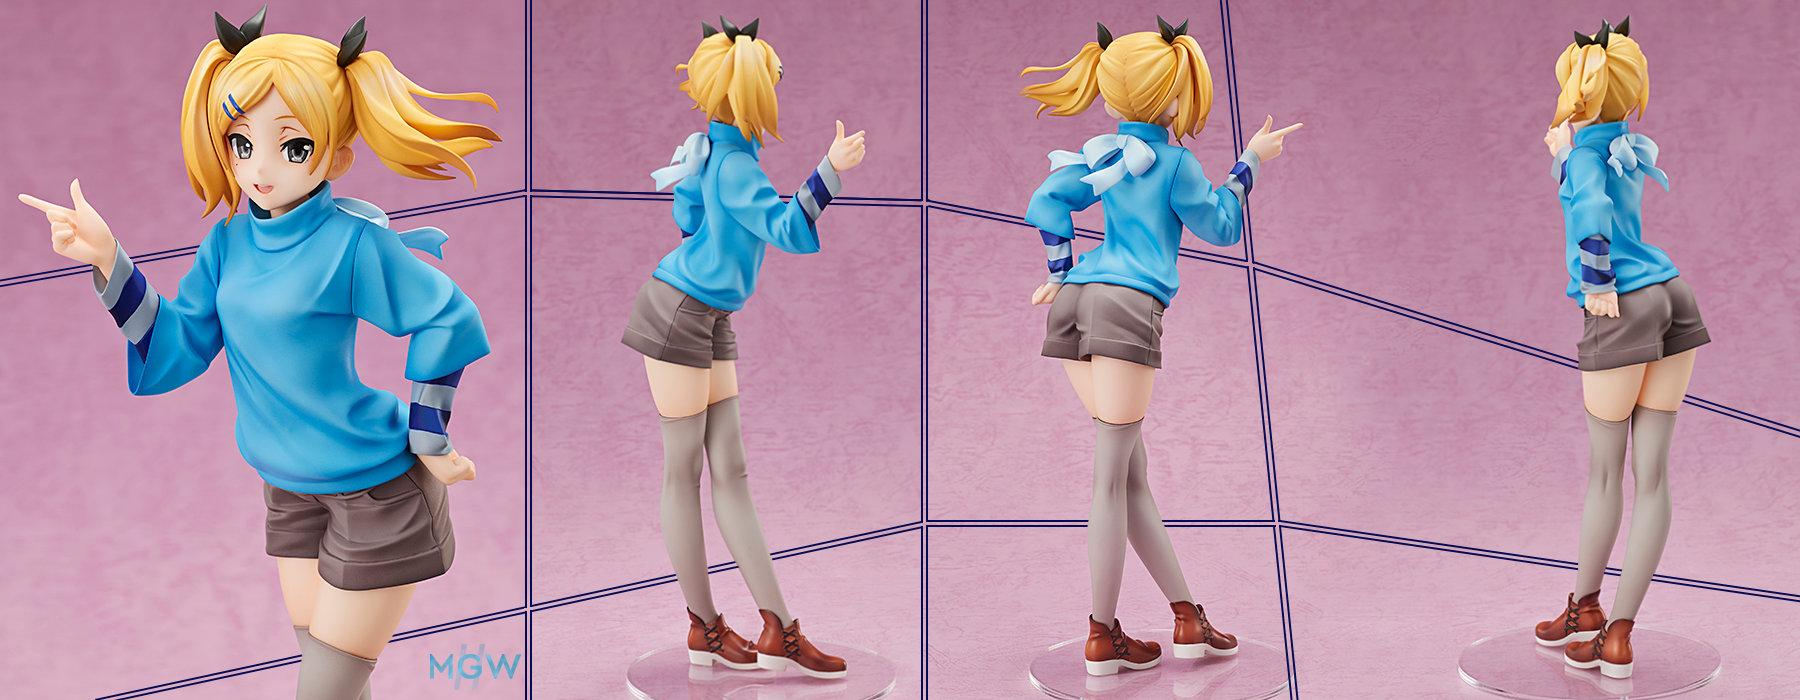 Yano Erika by AMAKUNI from Shirobako MGW Anime Figure Pre order Guide